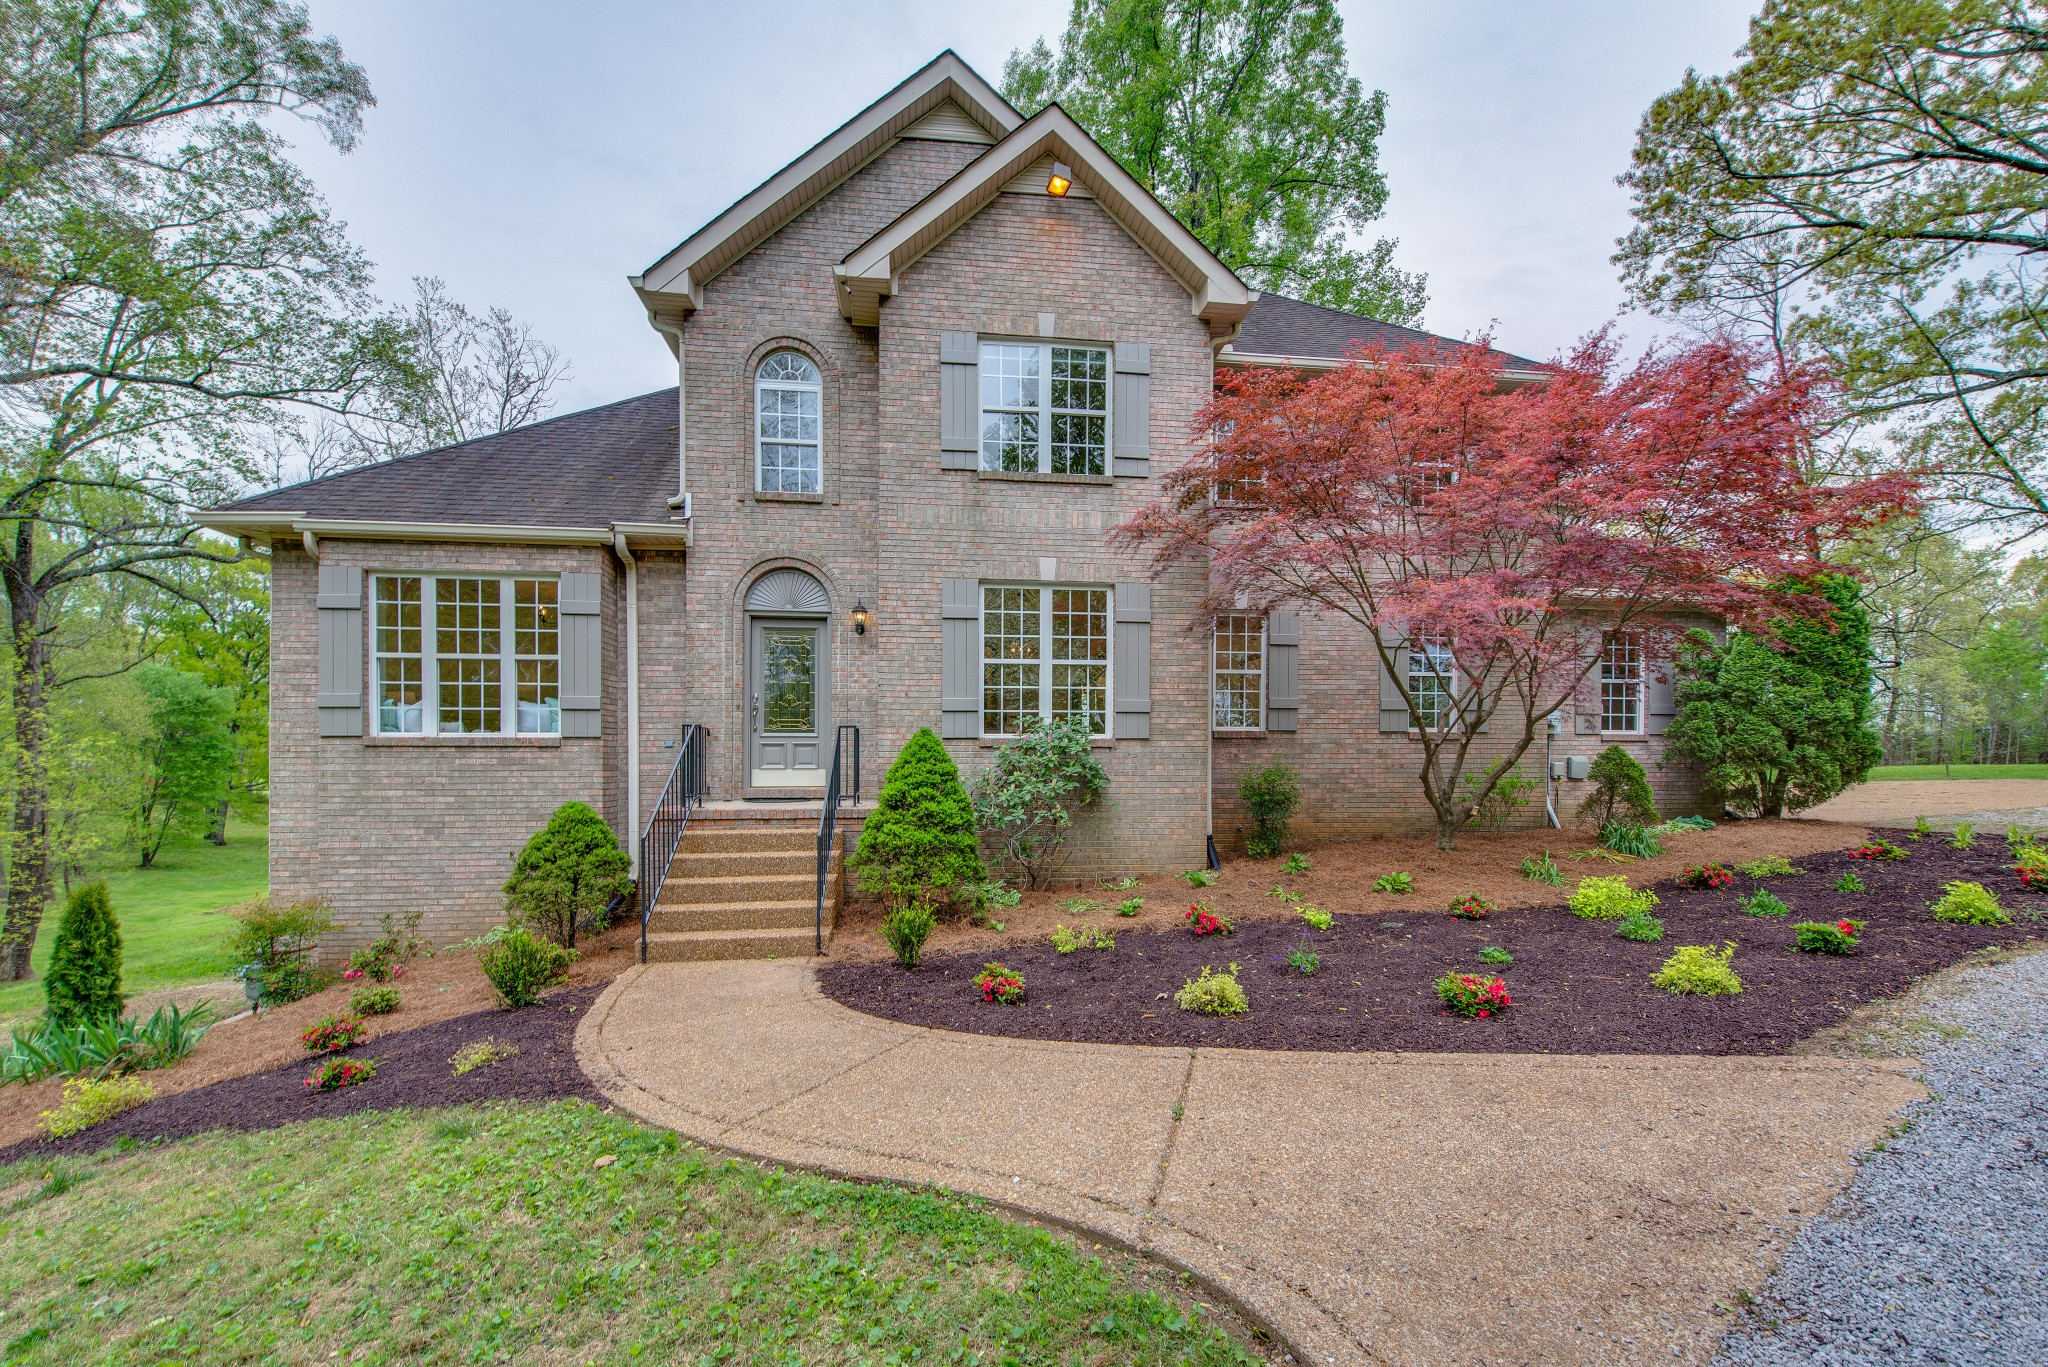 5021 Highpoint Rd, Pleasant View, TN 37146 - Pleasant View, TN real estate listing